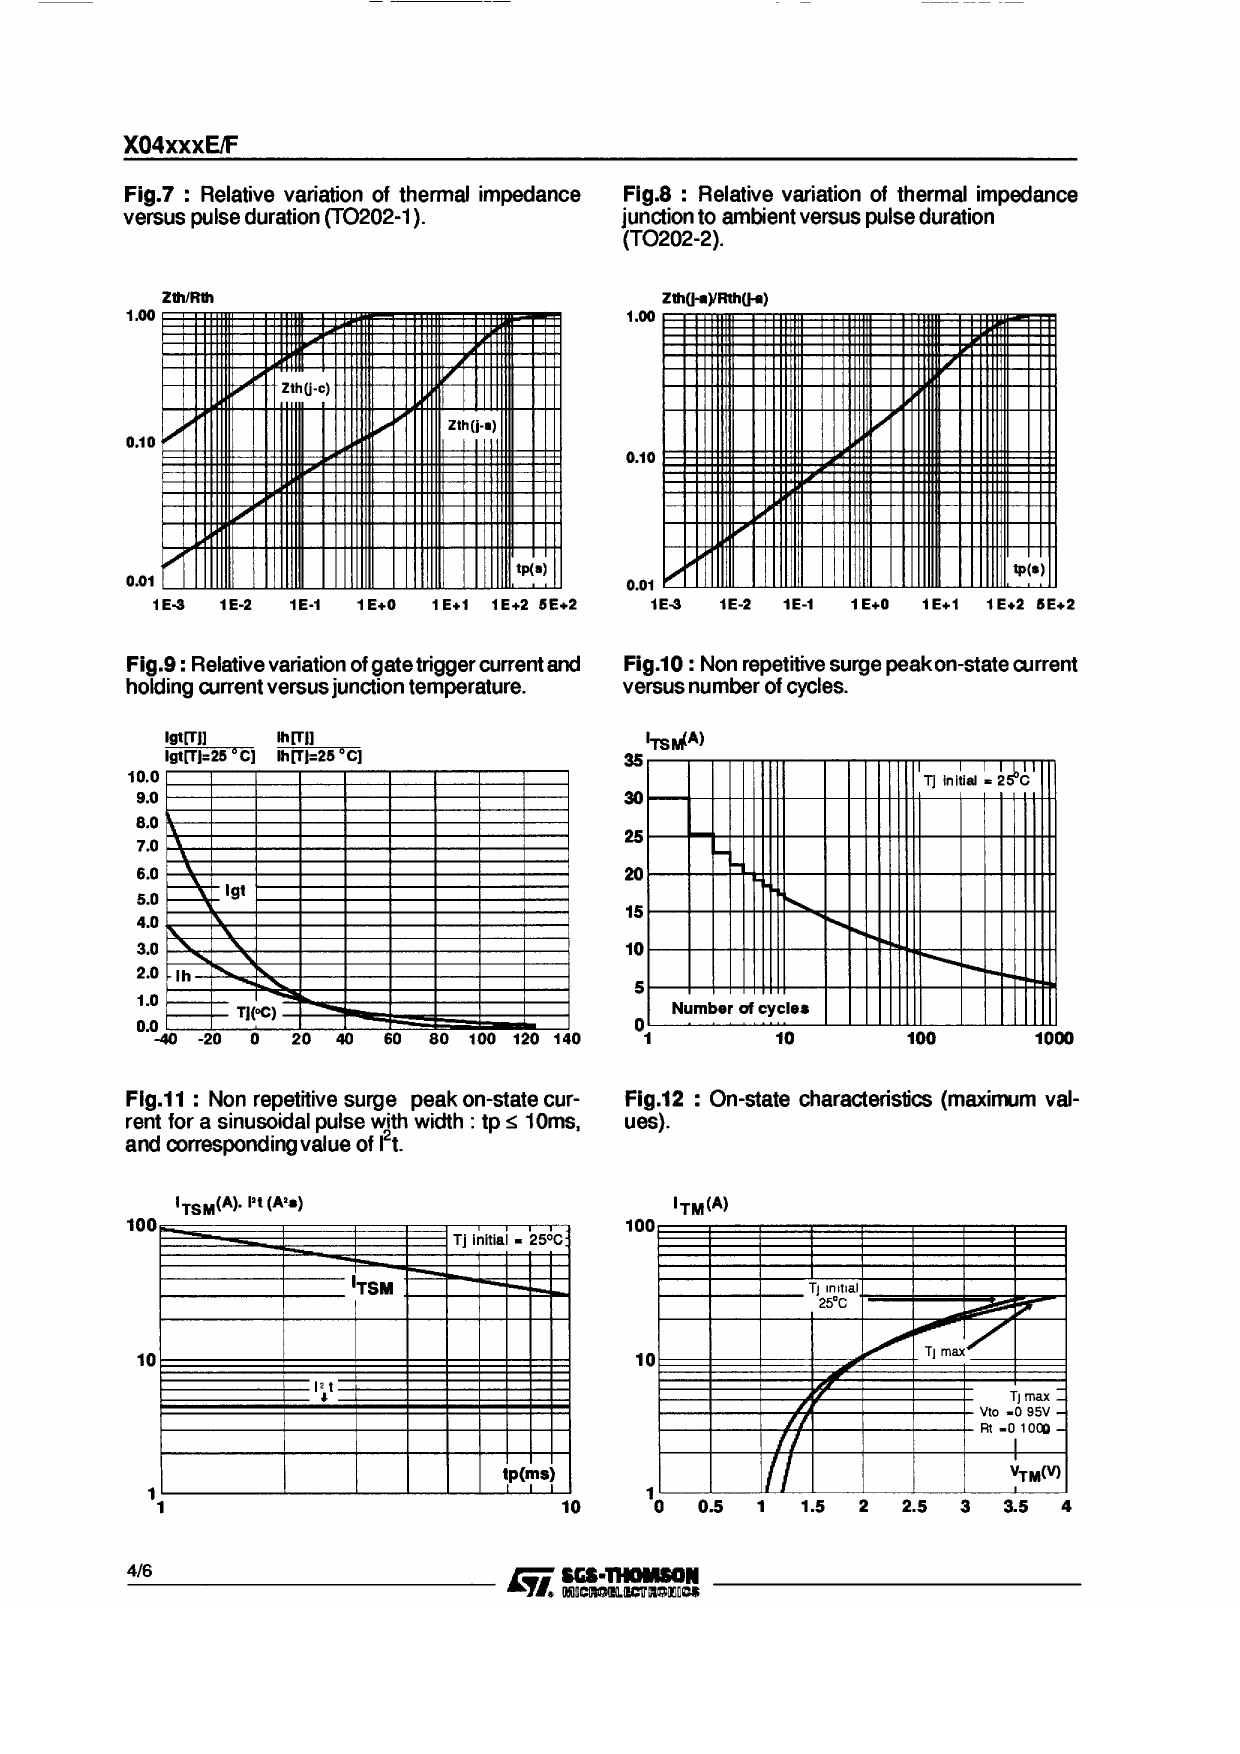 X0402BE pdf, 반도체, 판매, 대치품